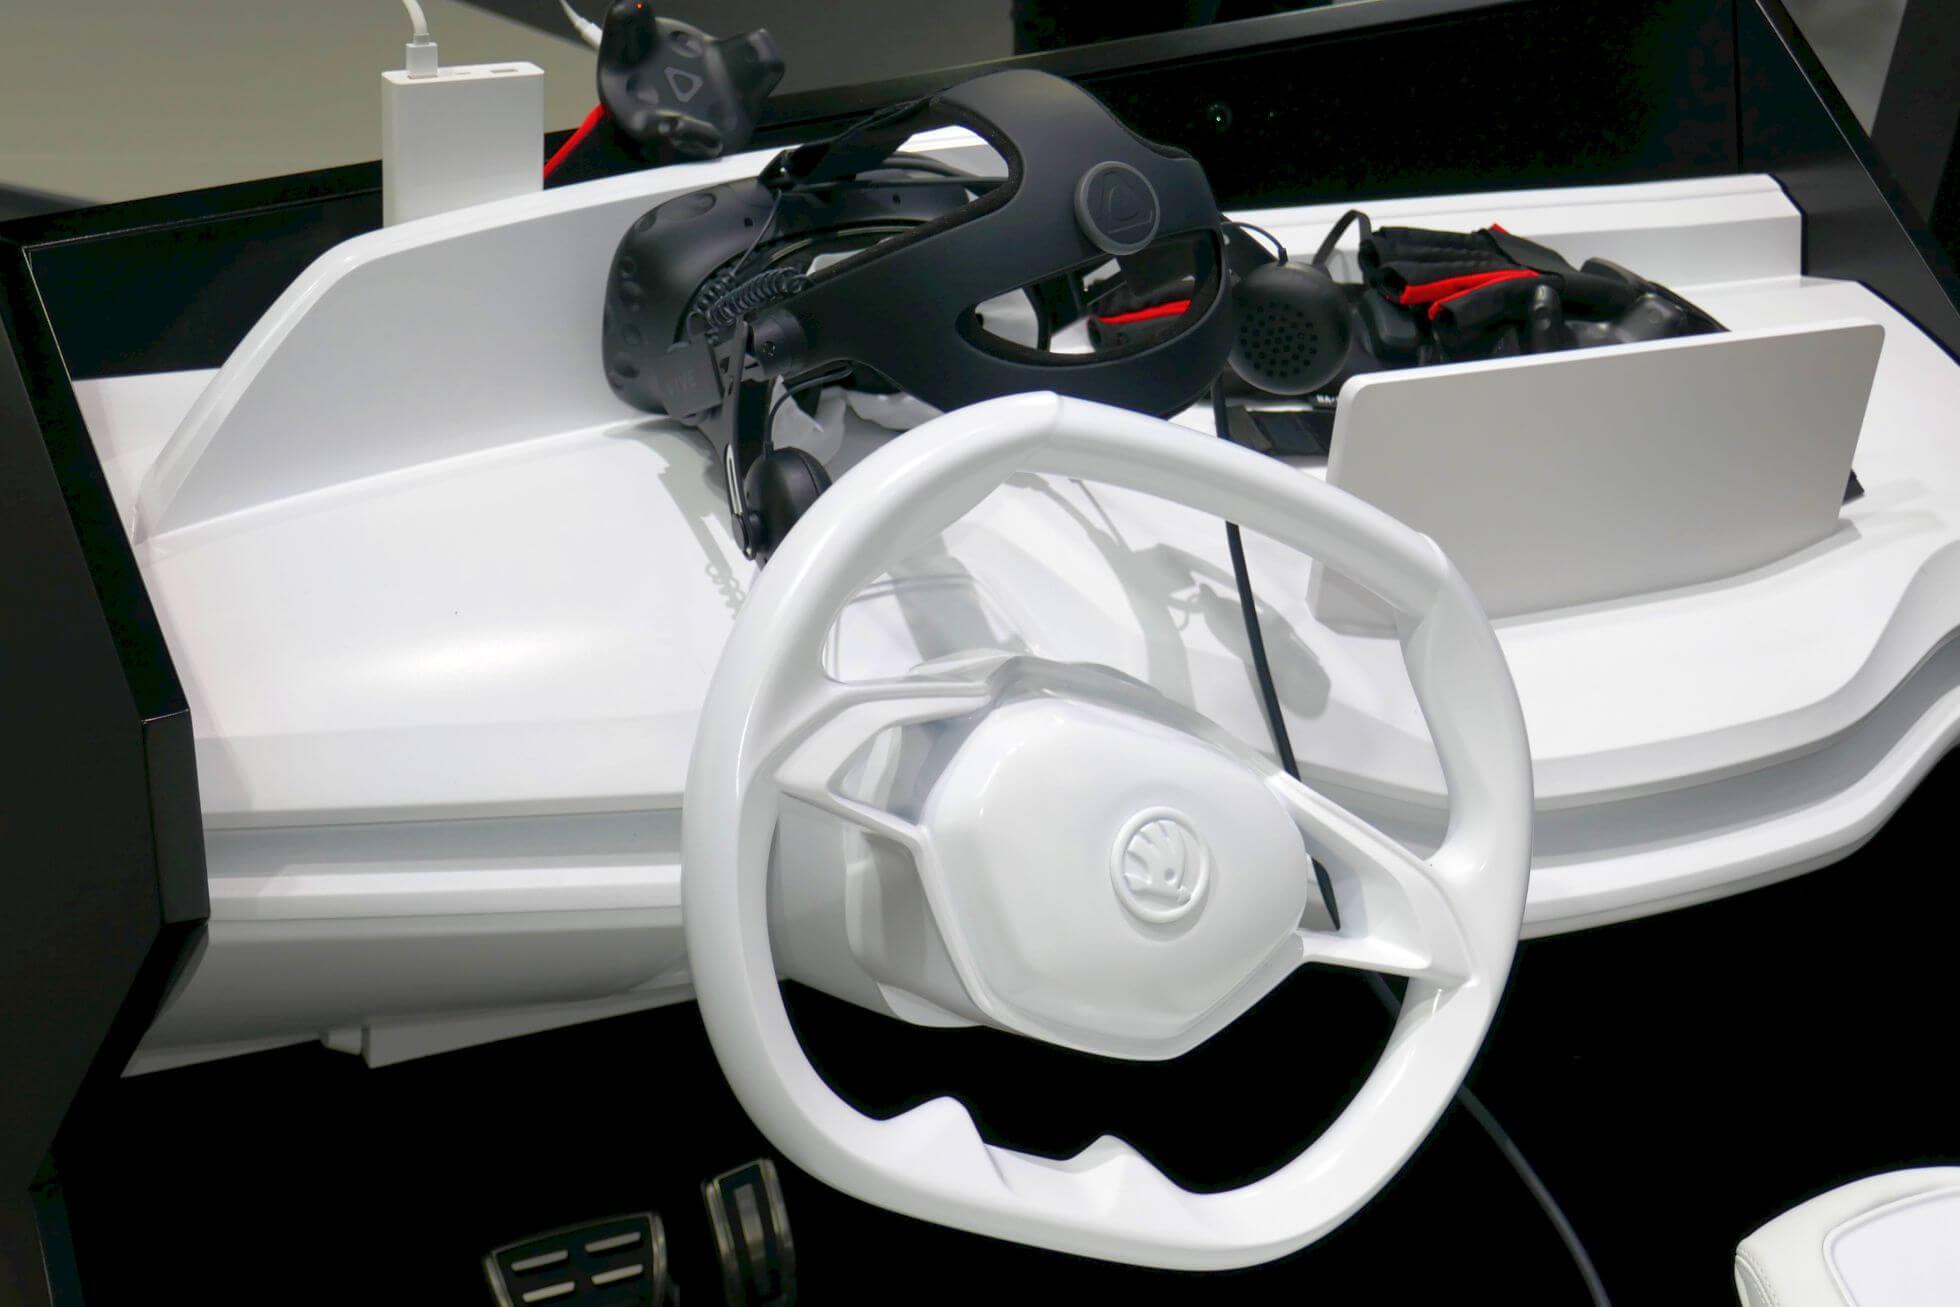 So sieht das Armaturenbrett des Skode Vision E-Cockpit-Mock-ups aus.